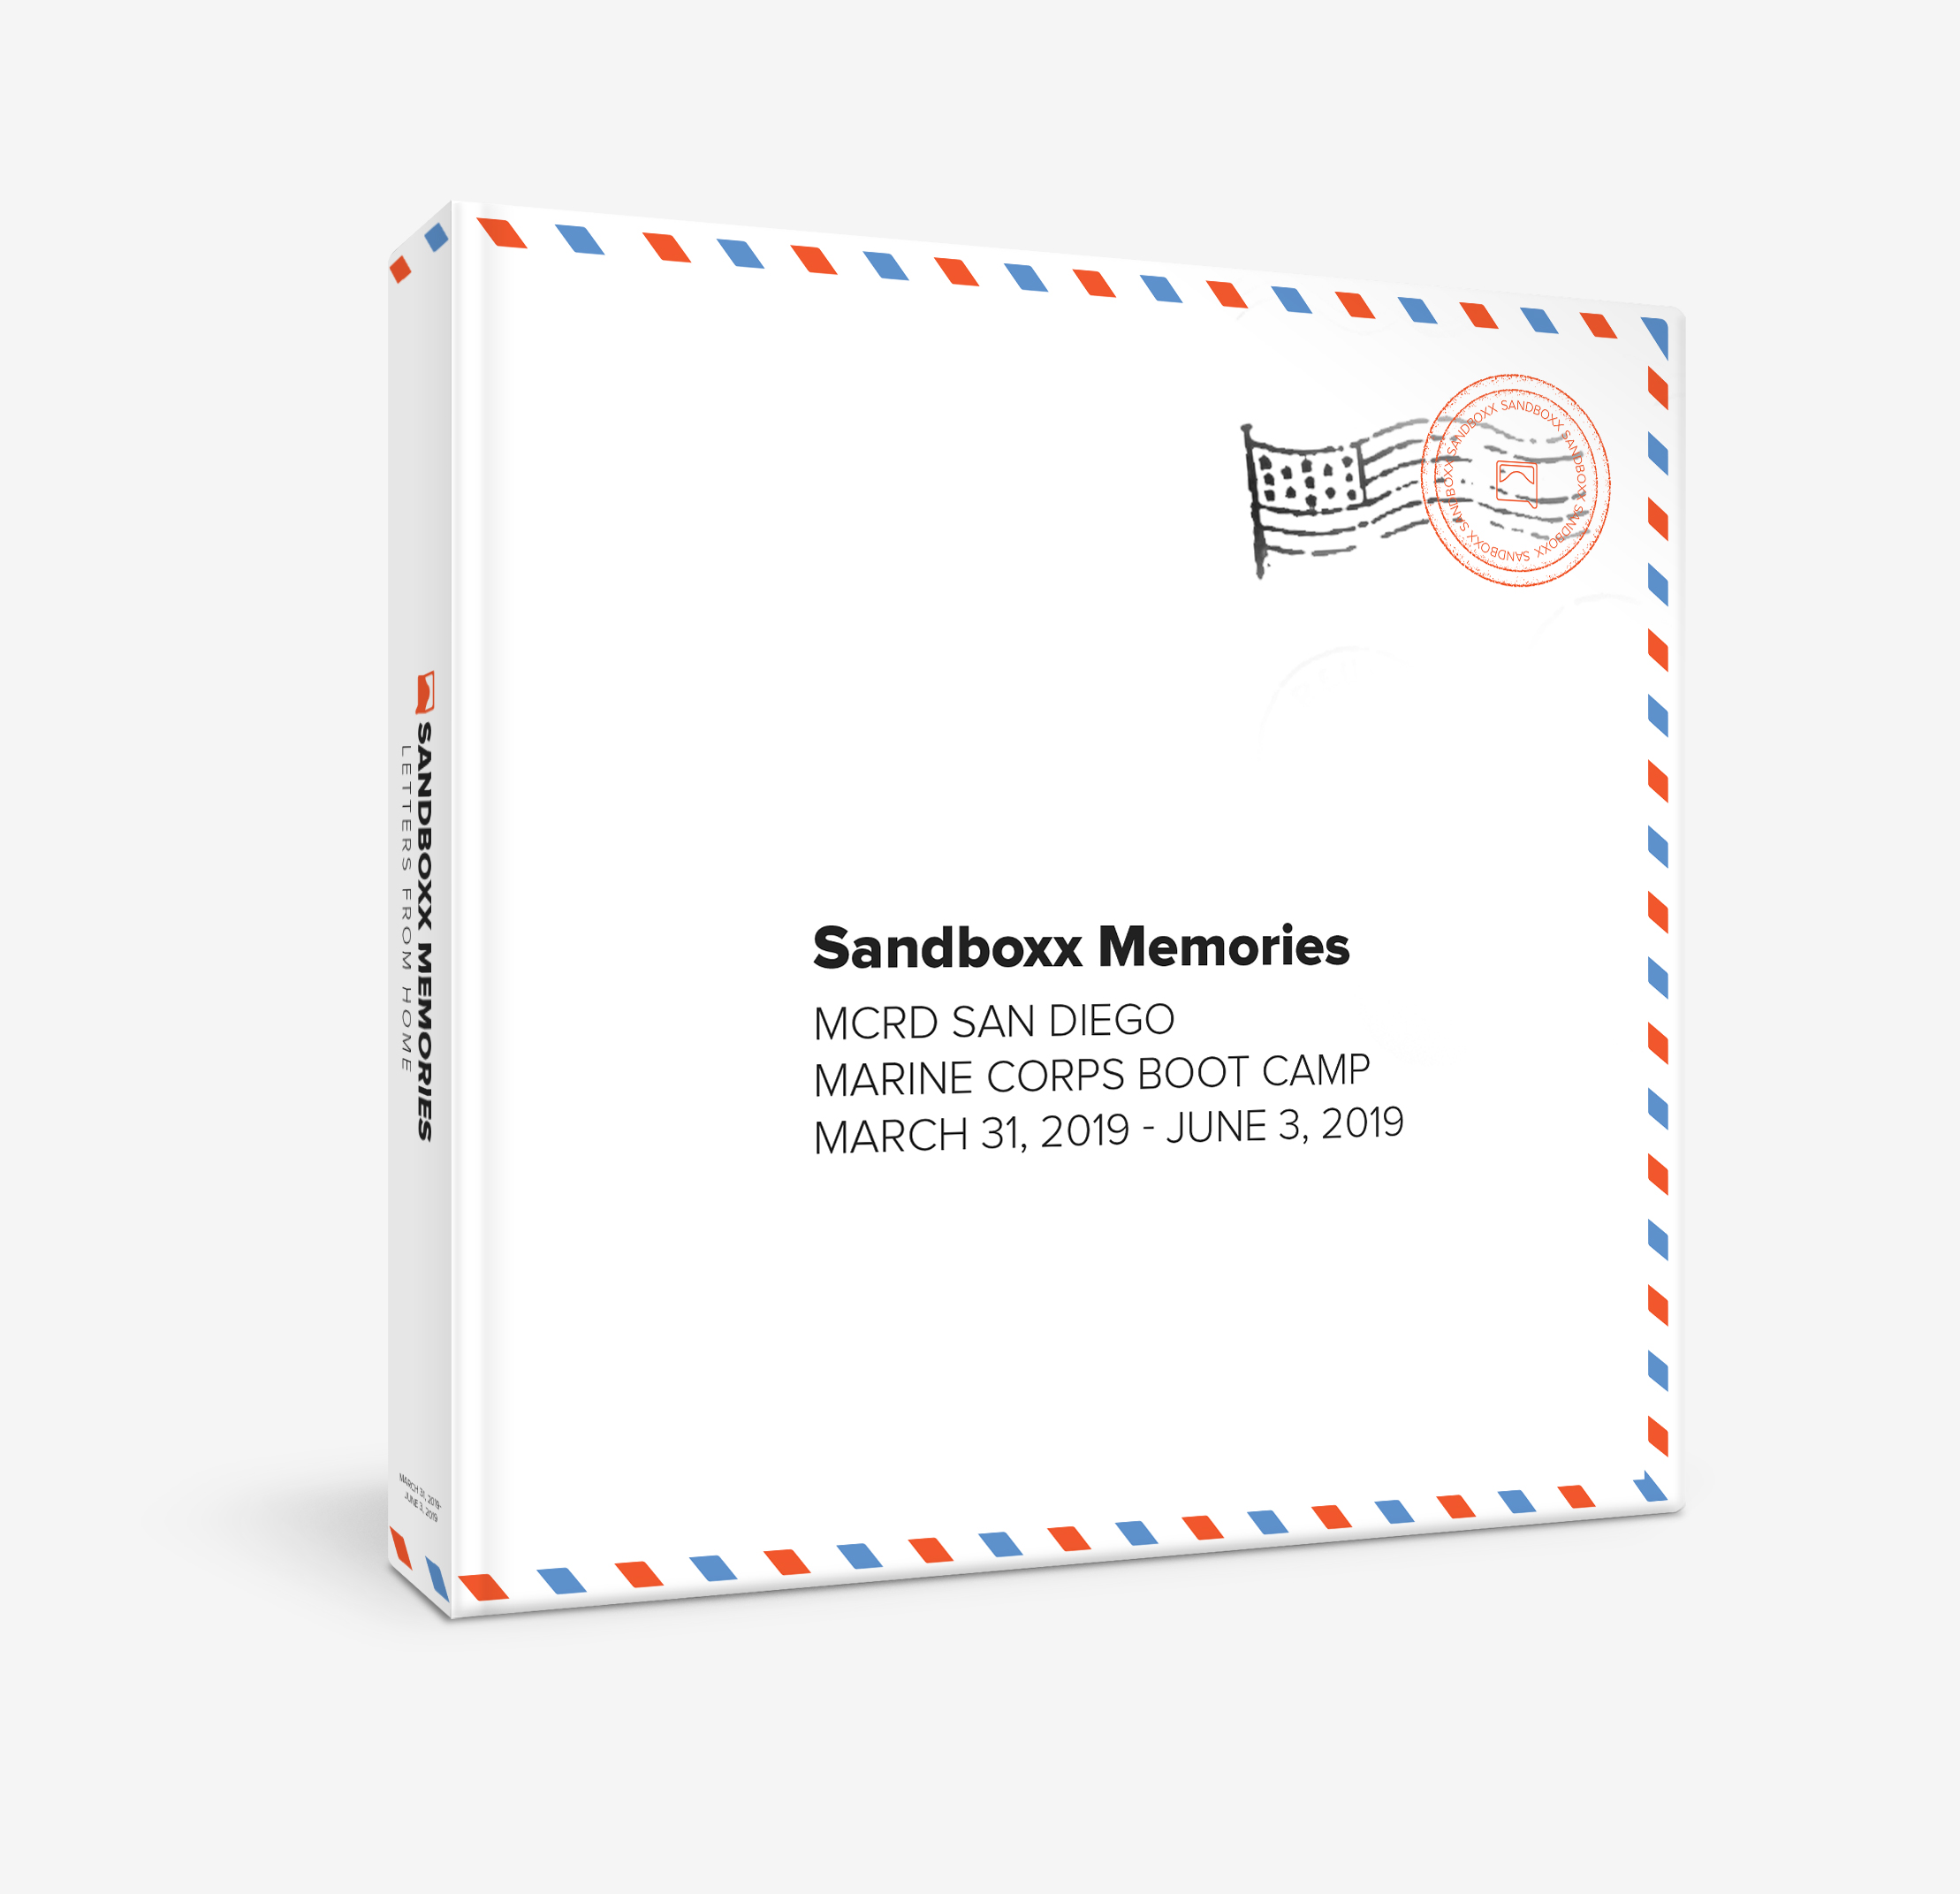 sandboxx memories.jpg